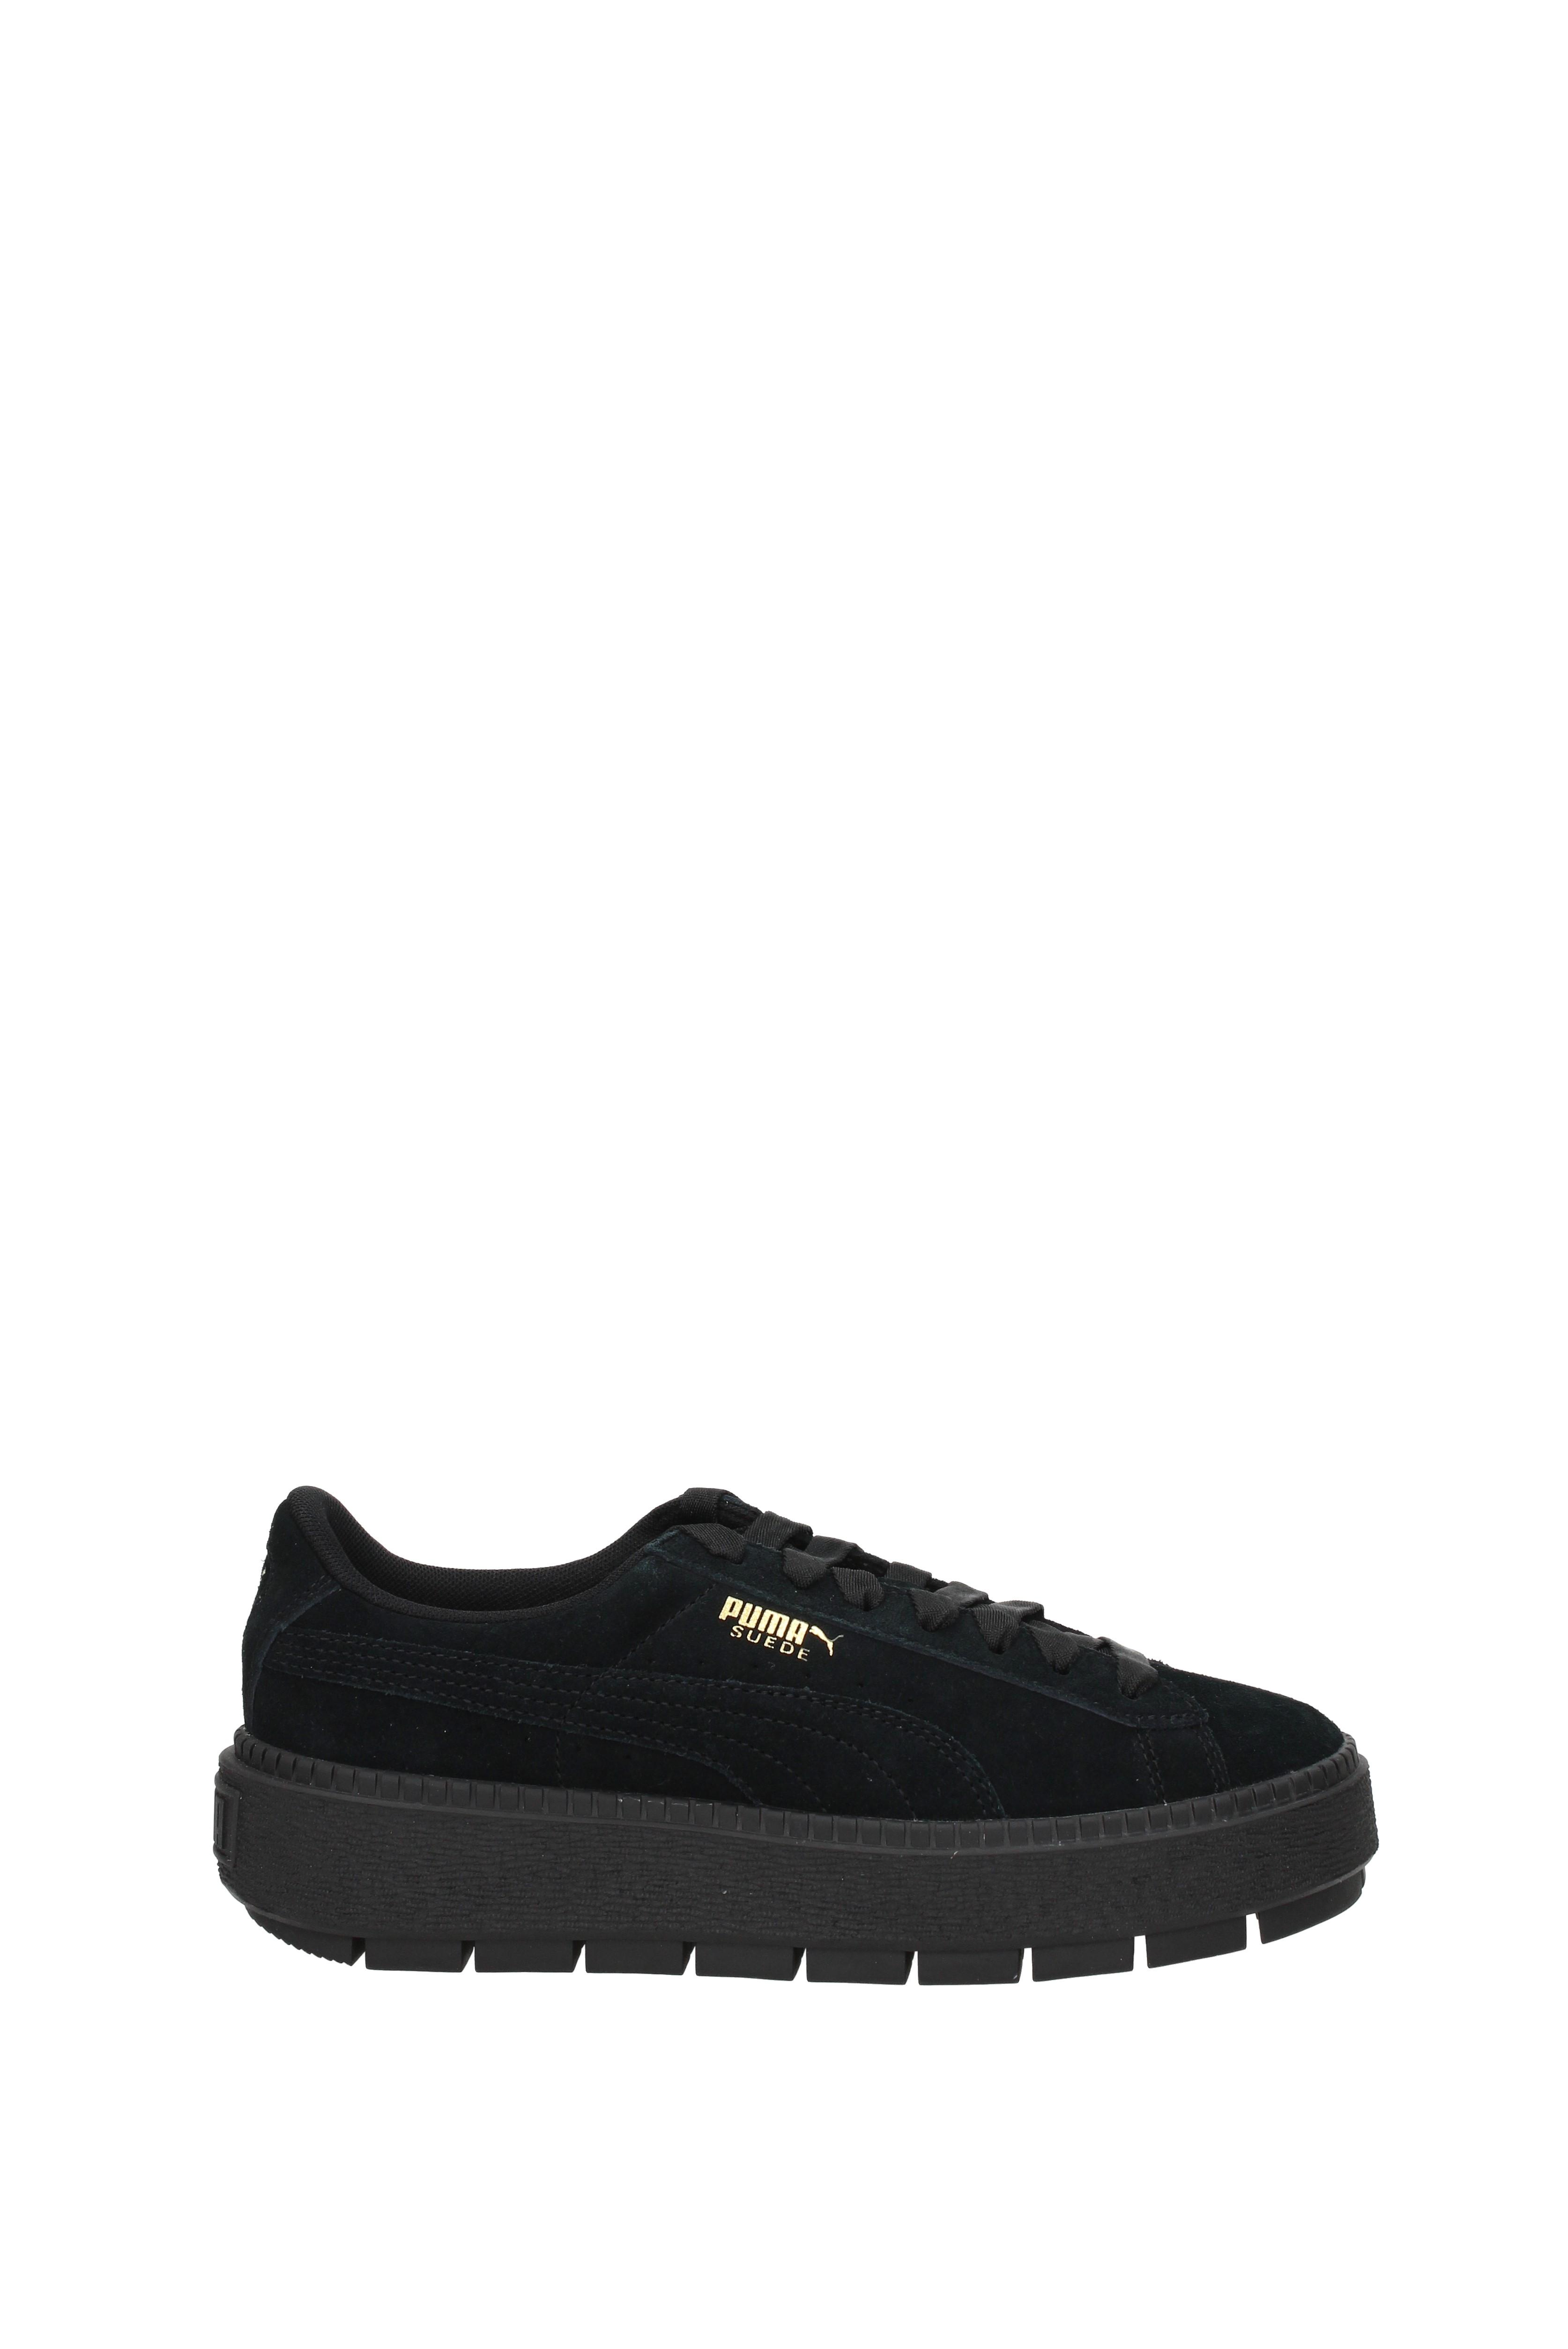 Femme Suede Platform Trace Sneakers 365830 Puma PZA8Wxv